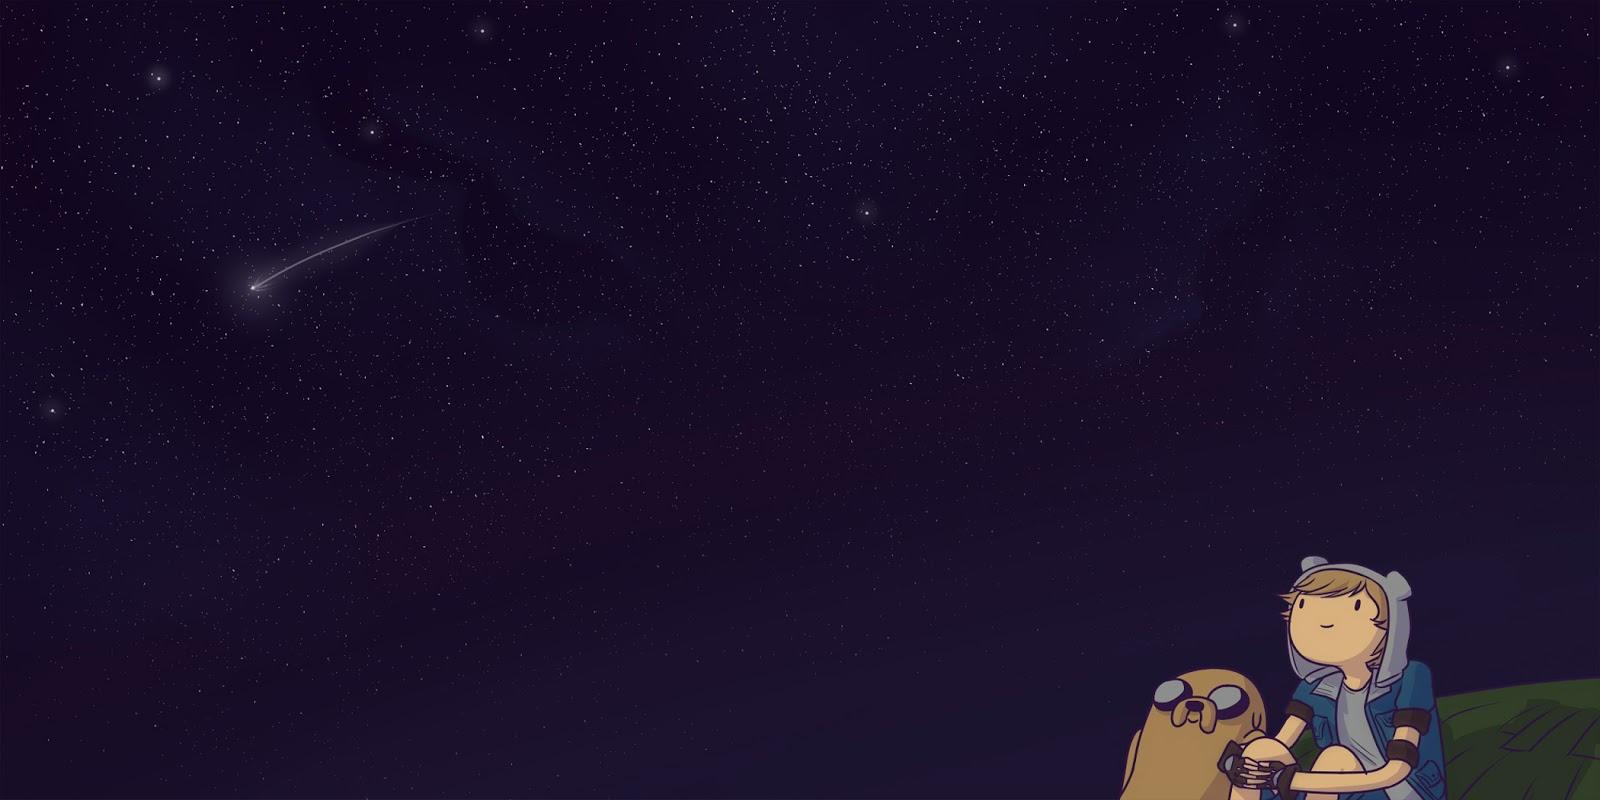 Sky Shooting Stars Scenery HD Wallpaper Desktop PC Background a157 1600x800